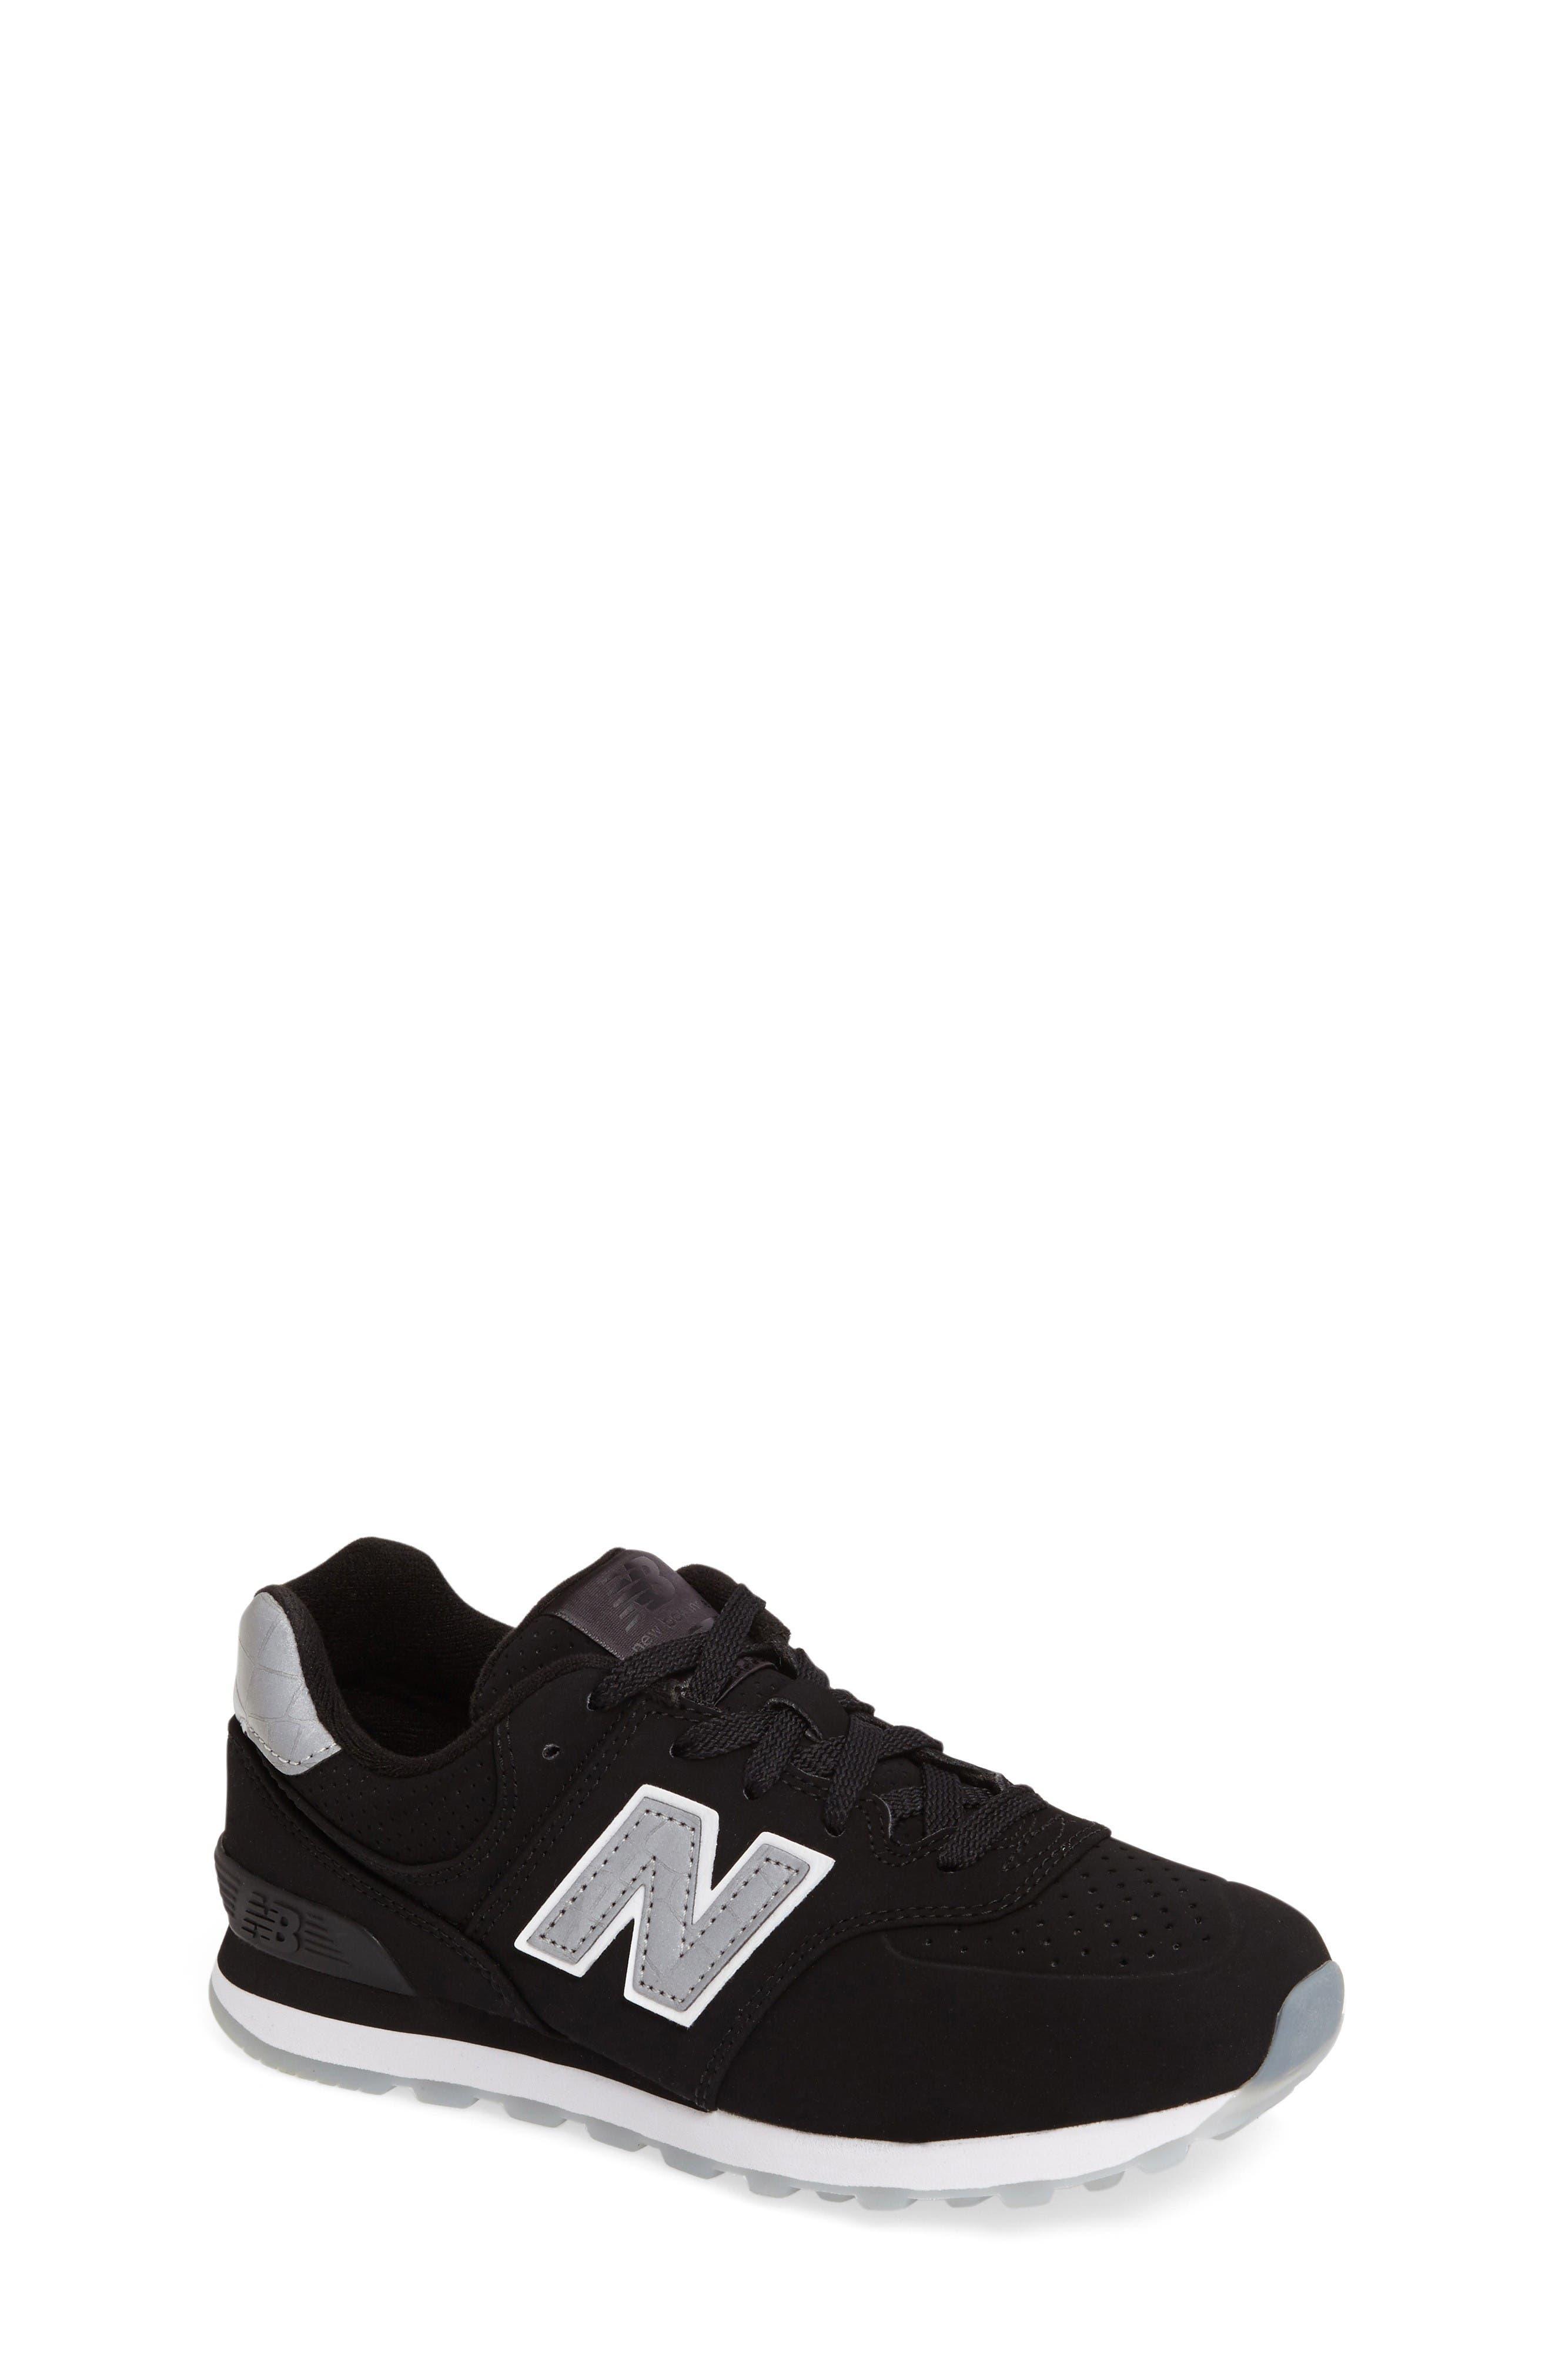 New Balance 574 Core Plus Sneaker (Baby, Walker, Toddler, Little Kid, Big Kid)